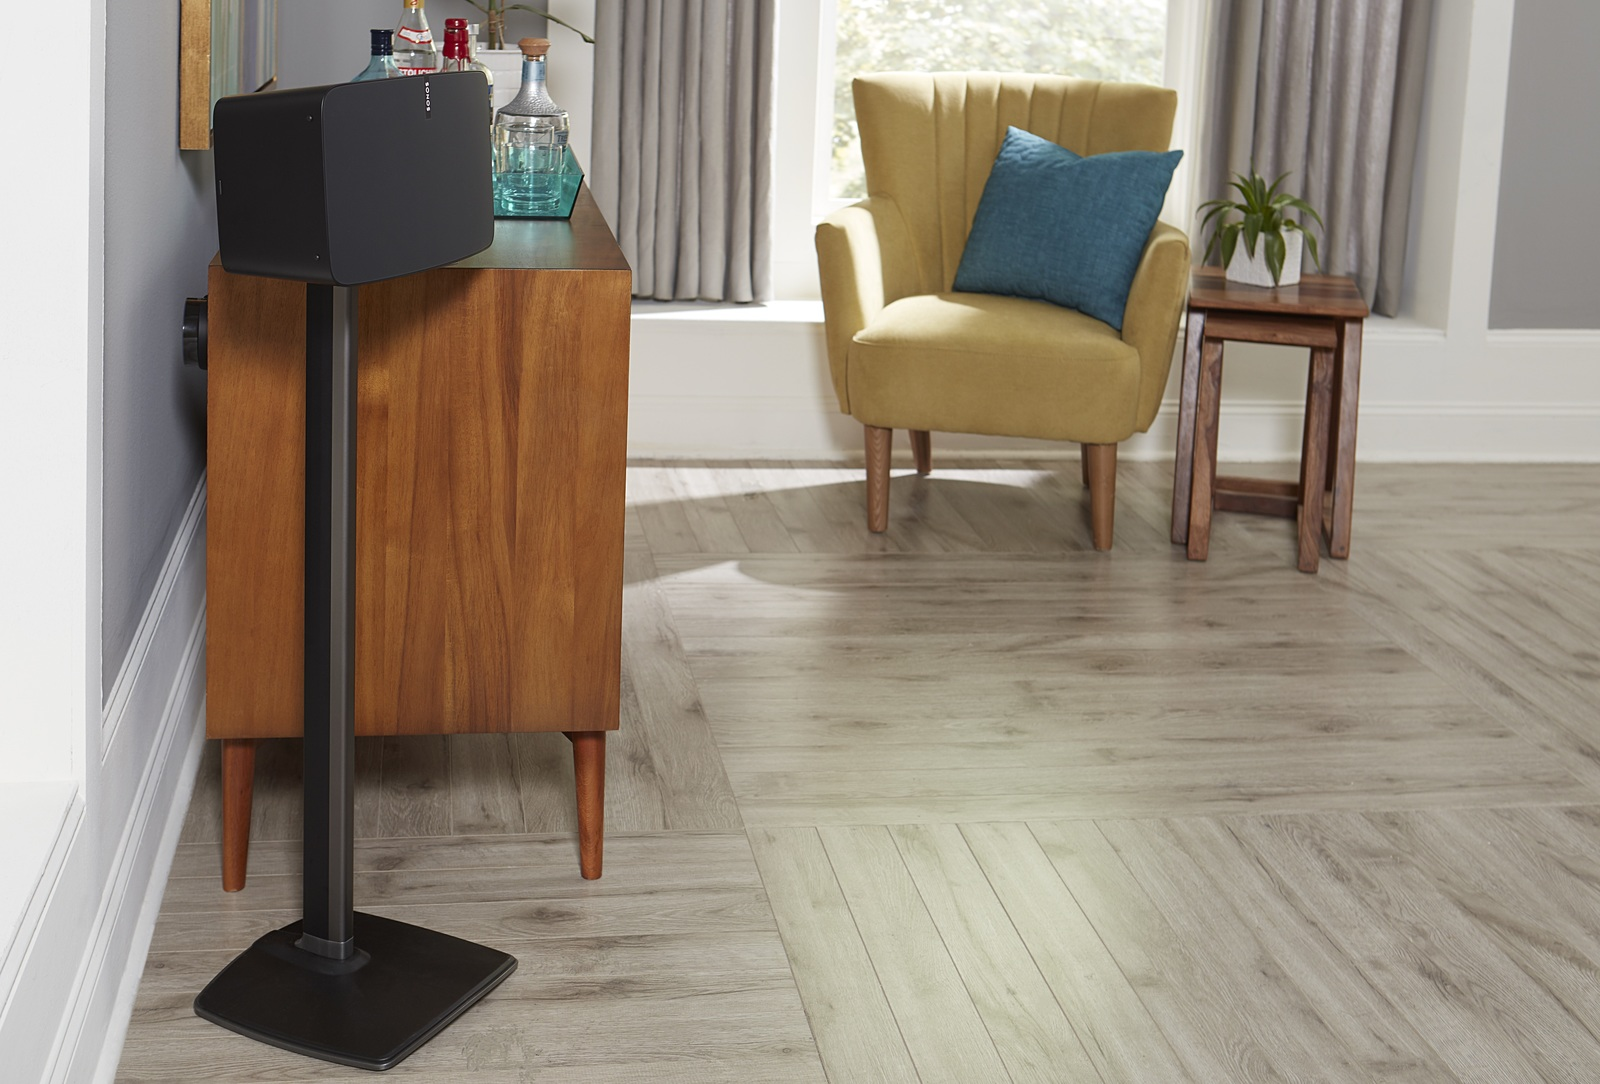 SANUS WSS51 Speaker Stand Designed to Hold Sonos Play:5 Speakers